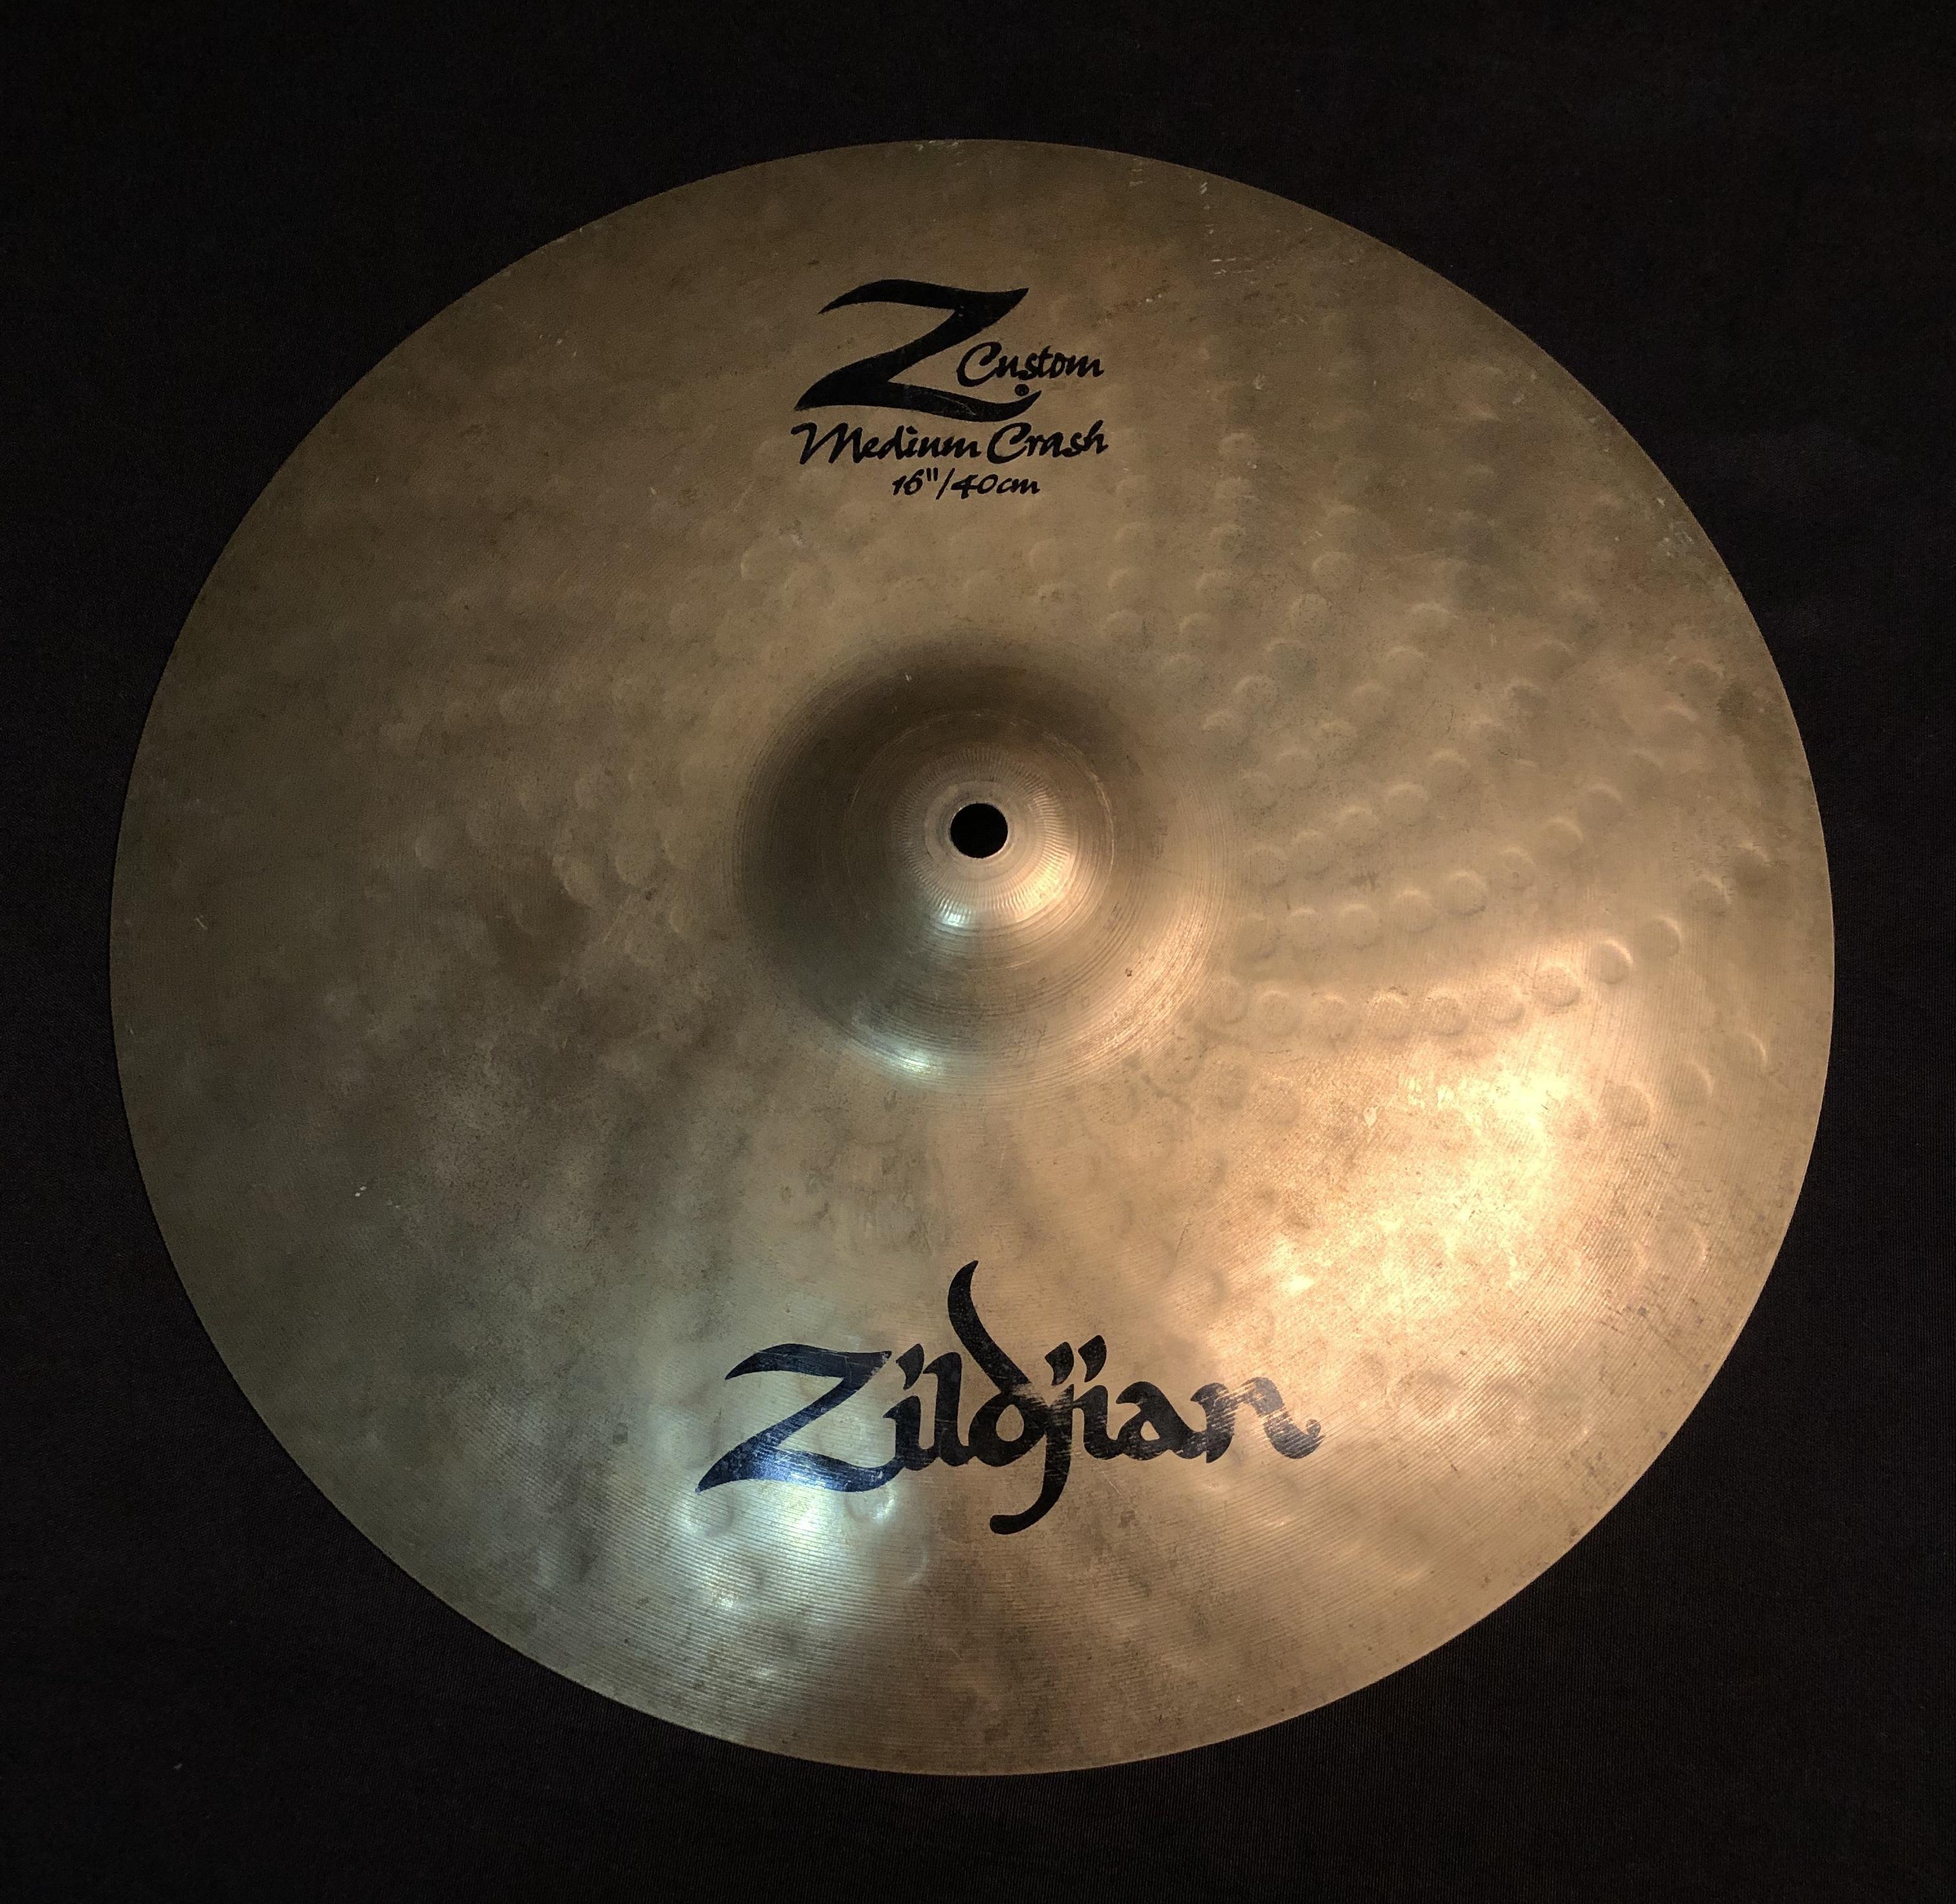 ZILDJIAN - Z Custom Medium Crash Cymbal 16